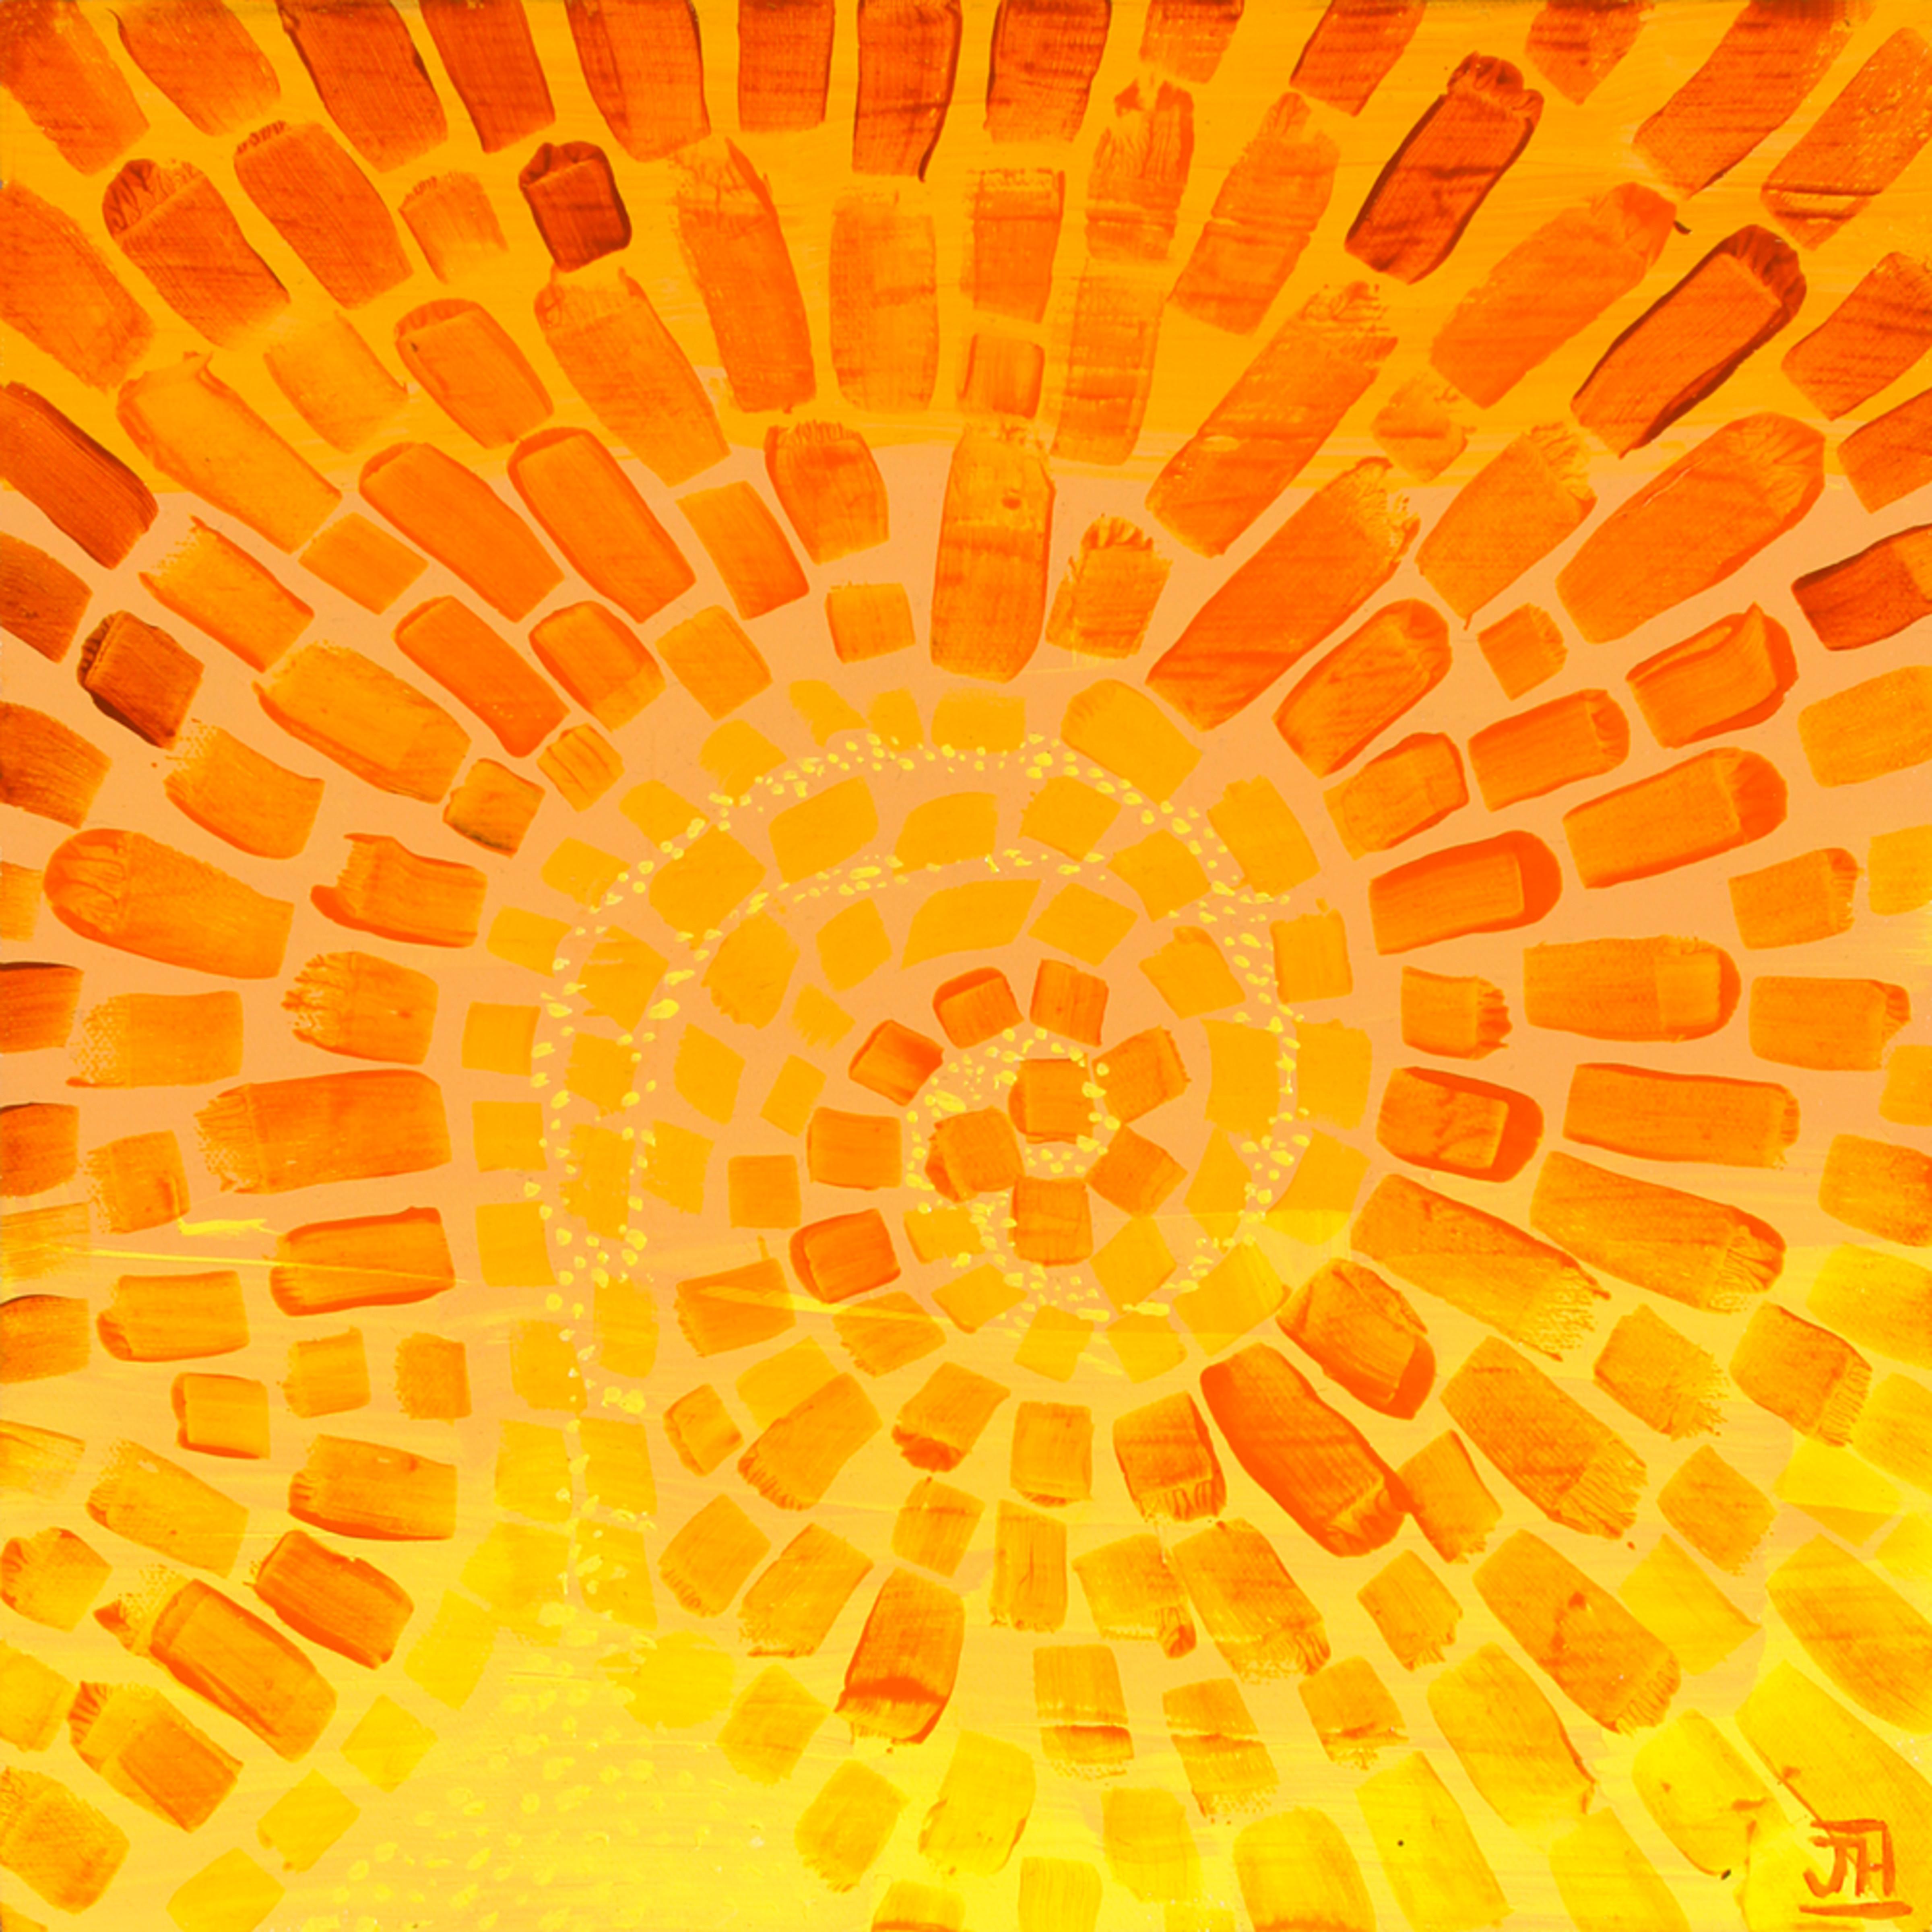 Sunburst jhahn aoouvh